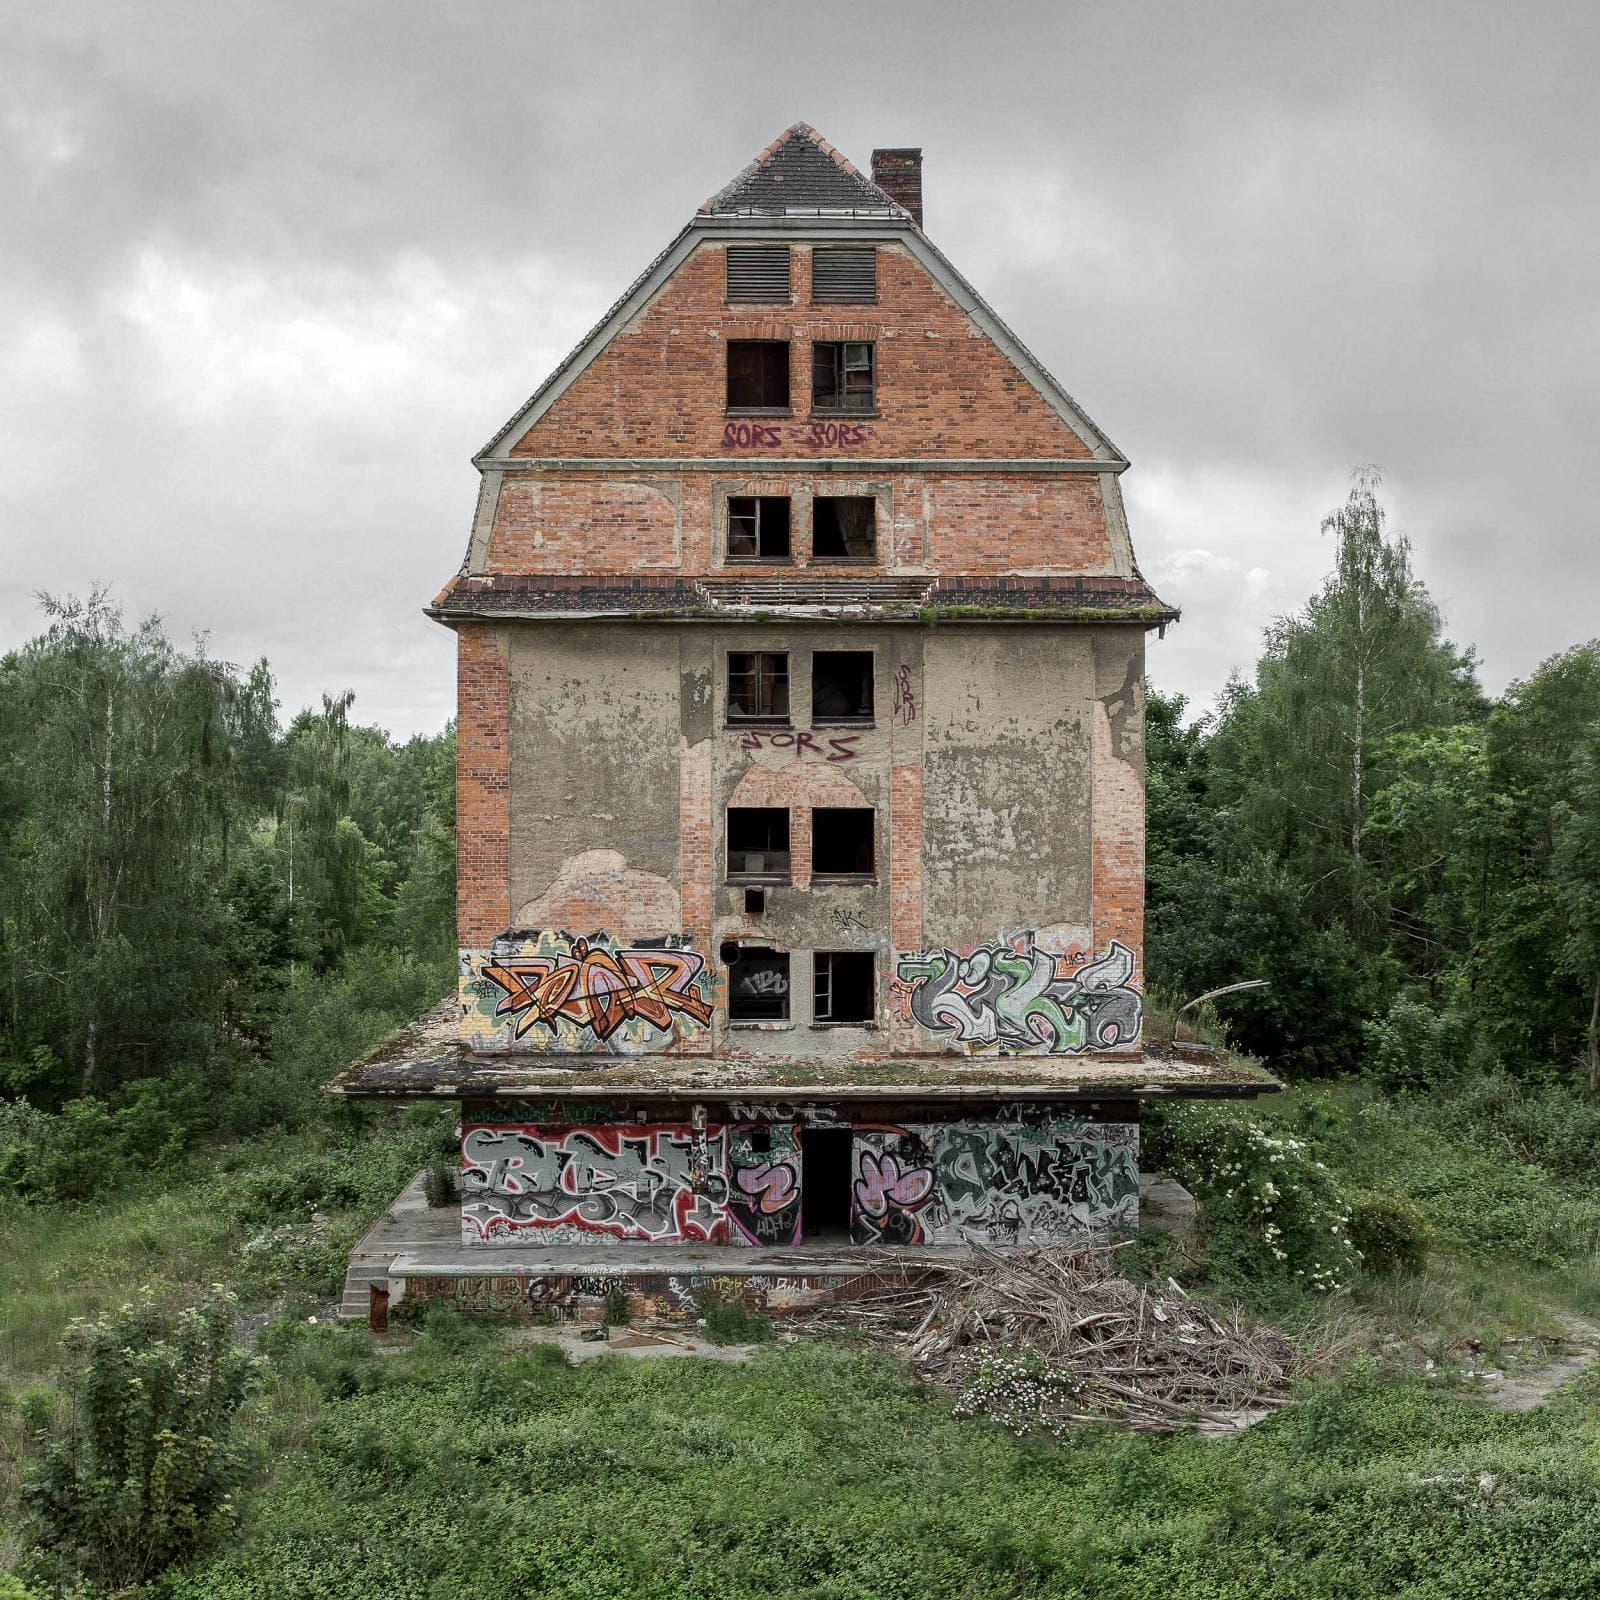 Regentaucher Architekturfotografie | Awaiting Leipzig Sors